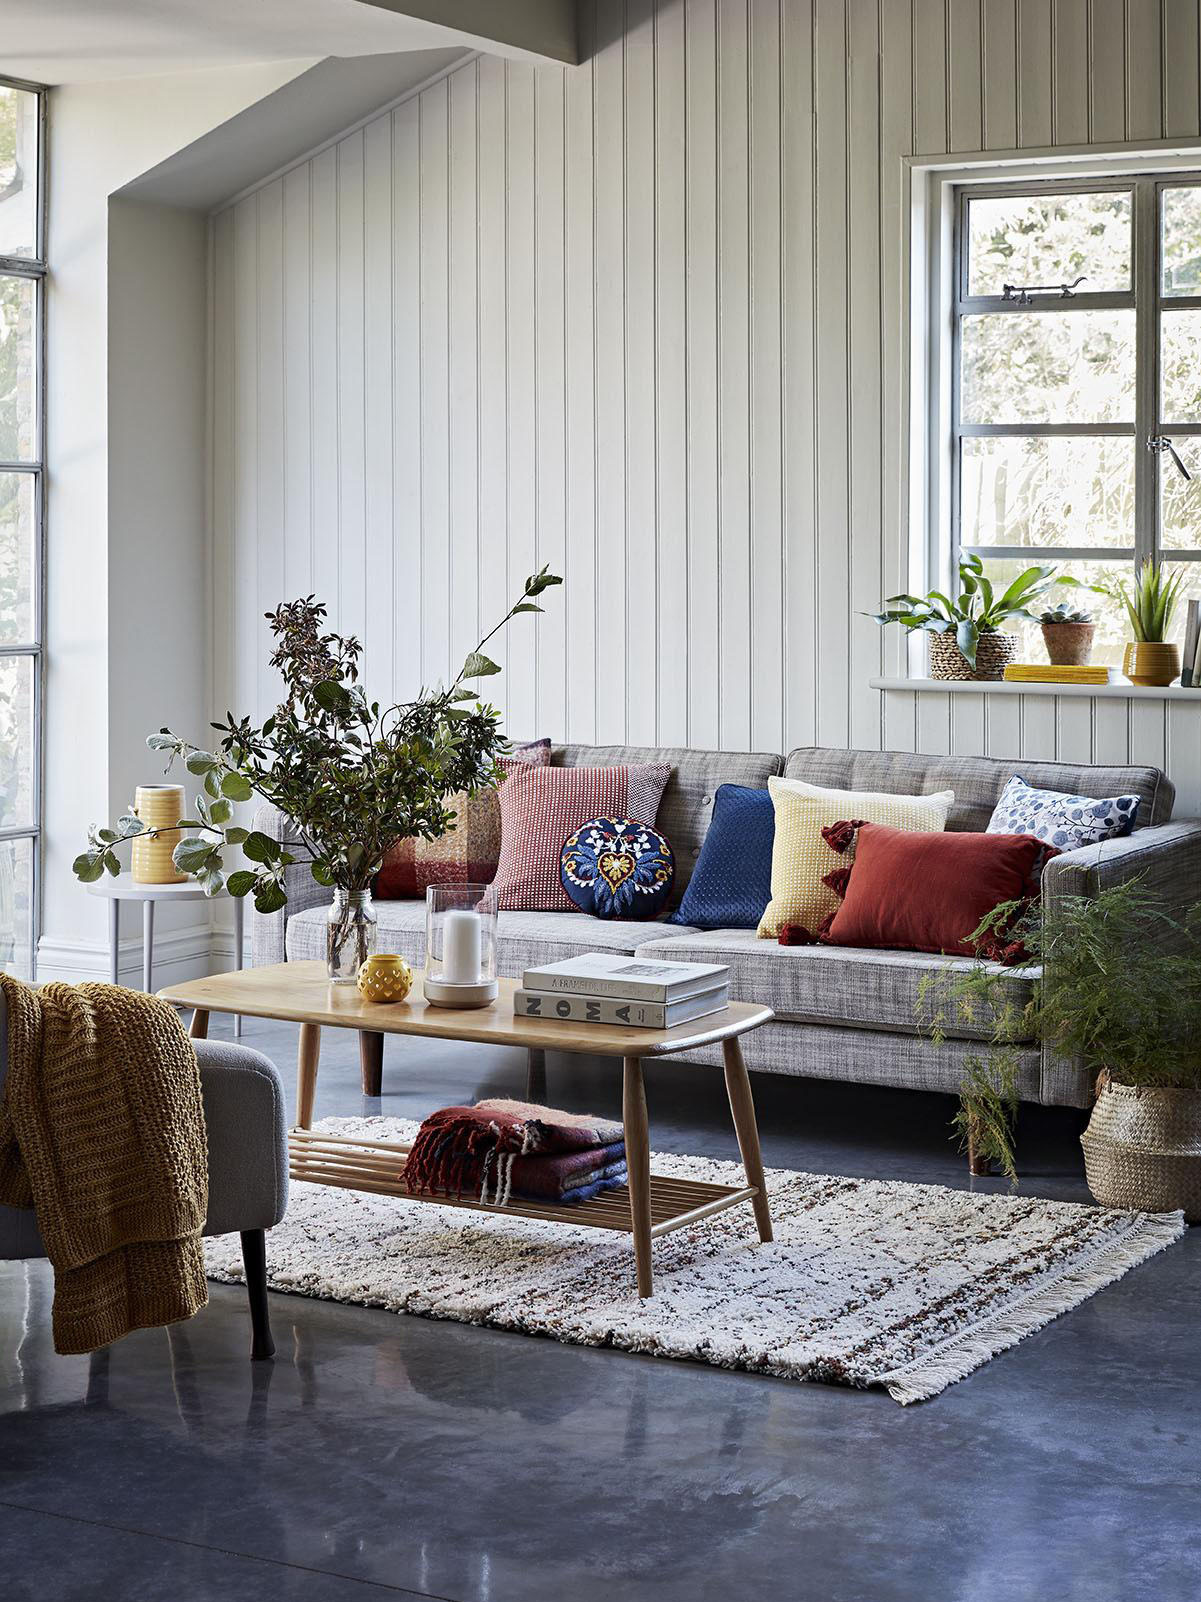 《George Home》2020秋冬圣诞节主题家居用品系列Lookbook